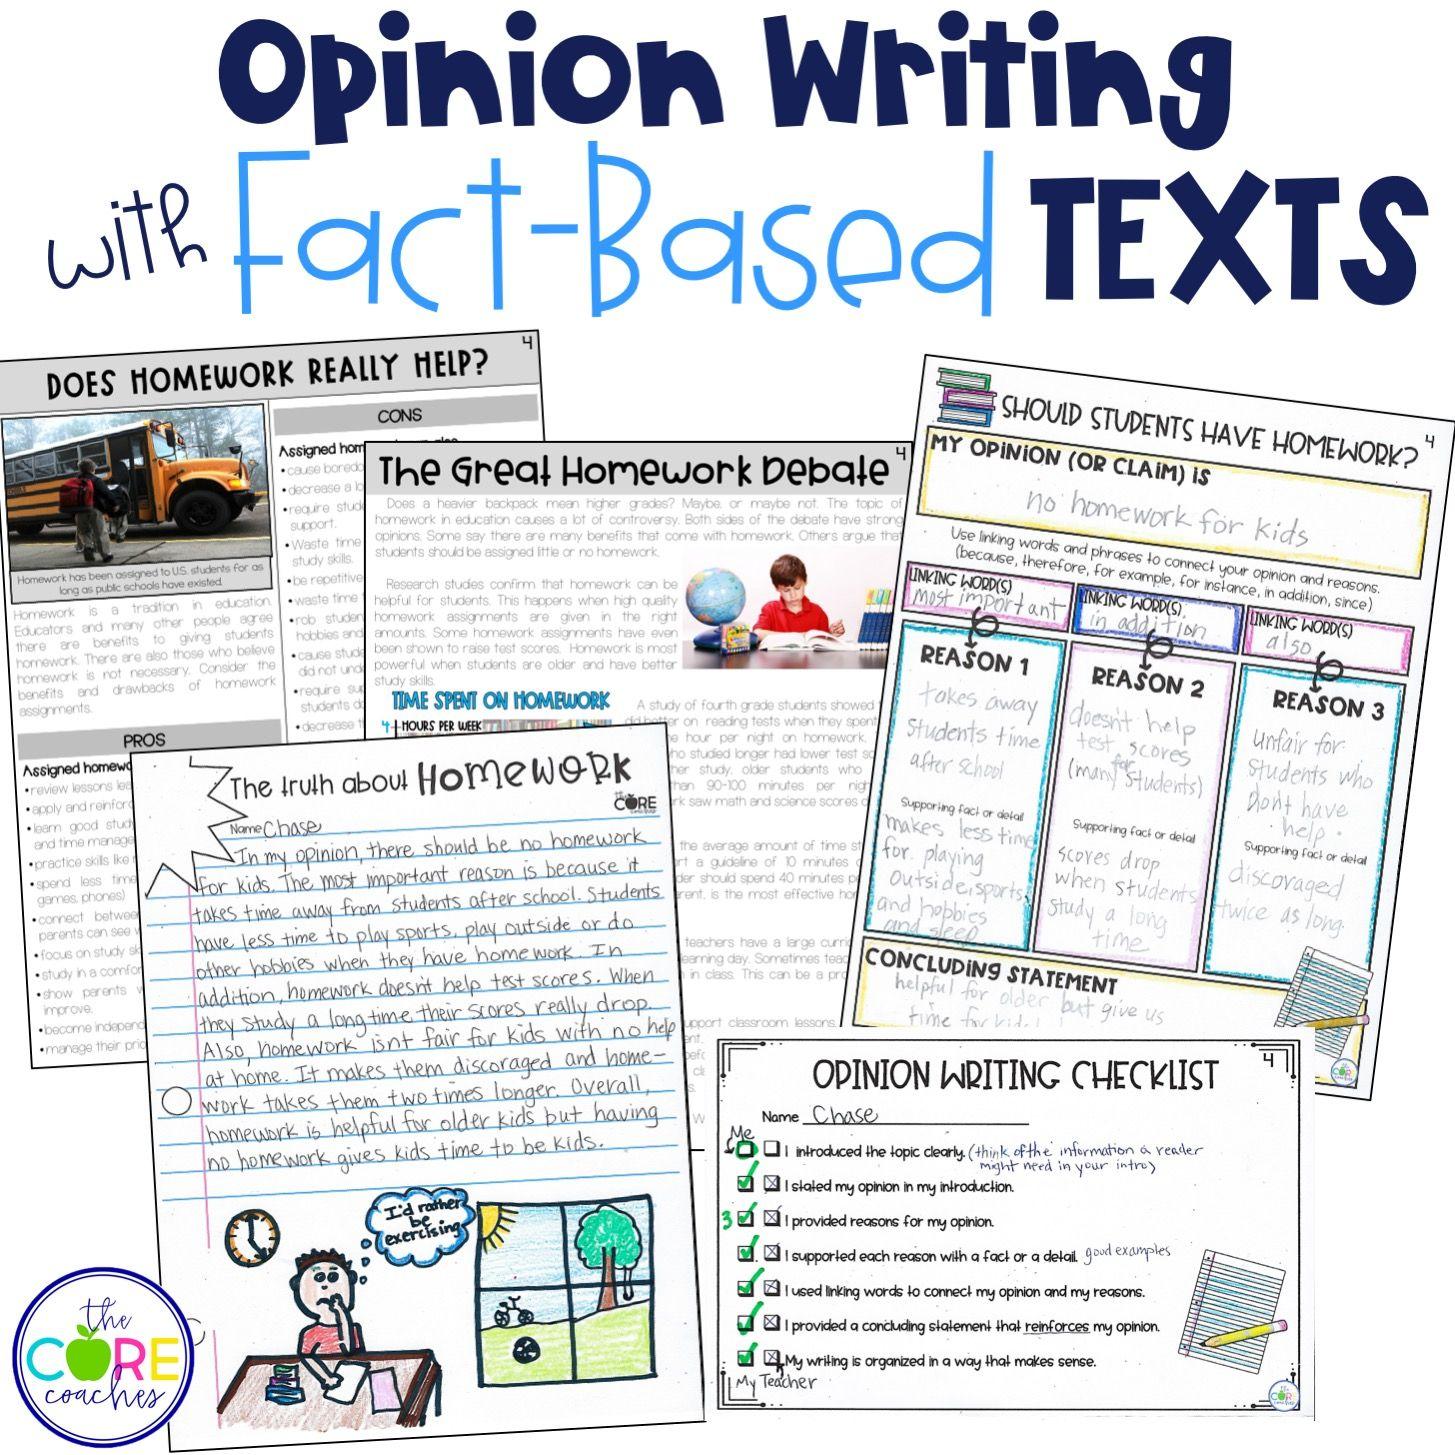 Cheap creative essay editor website for mba